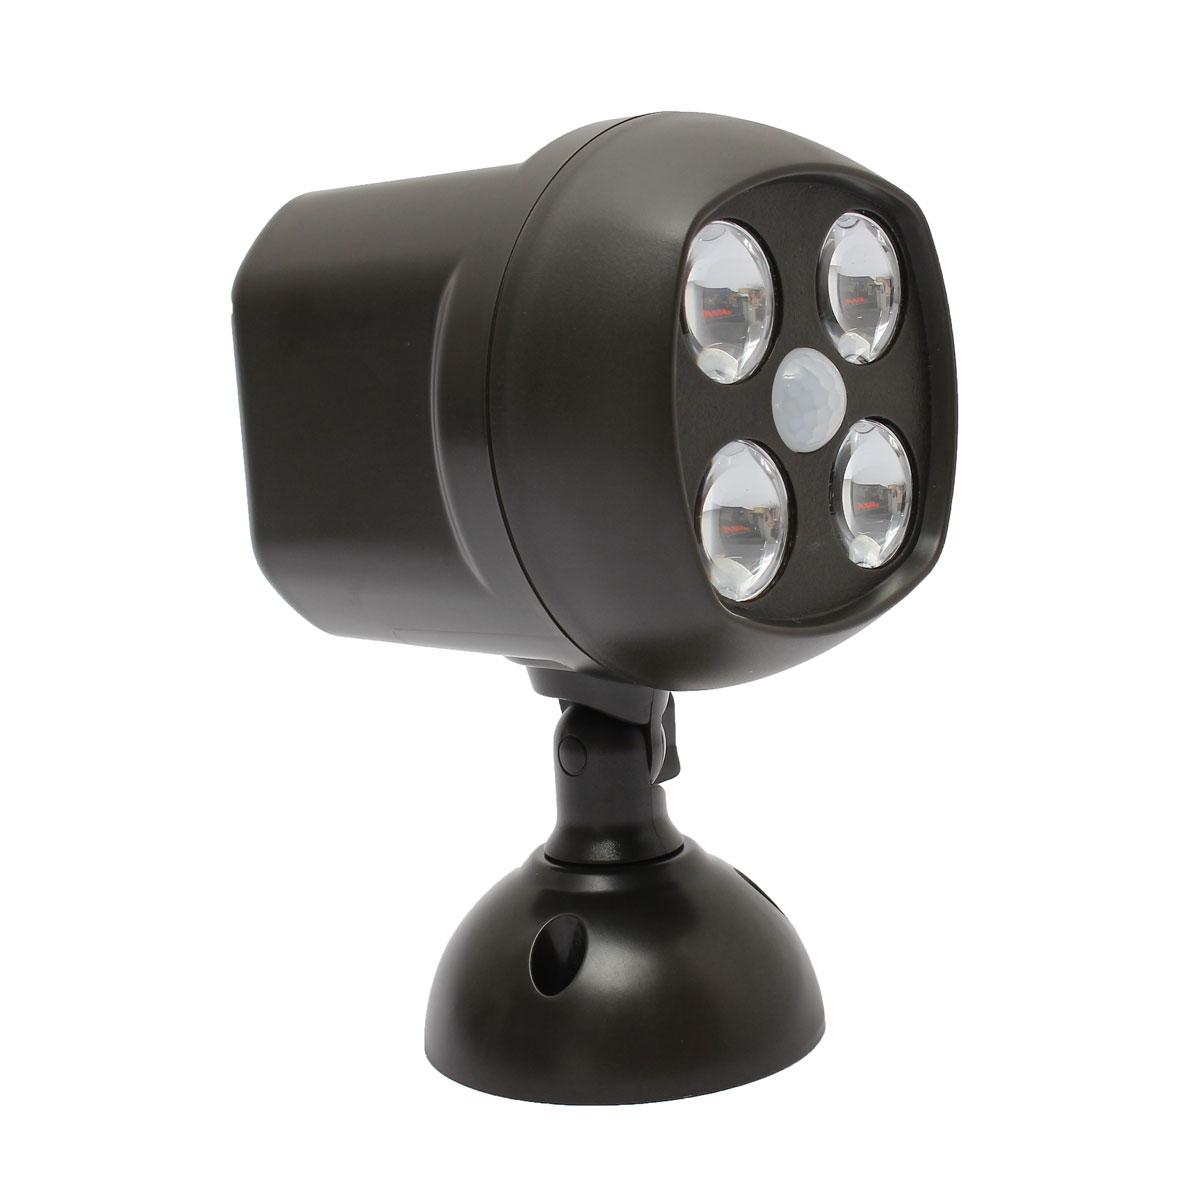 Super bright motion detector waterproof auto sensor led